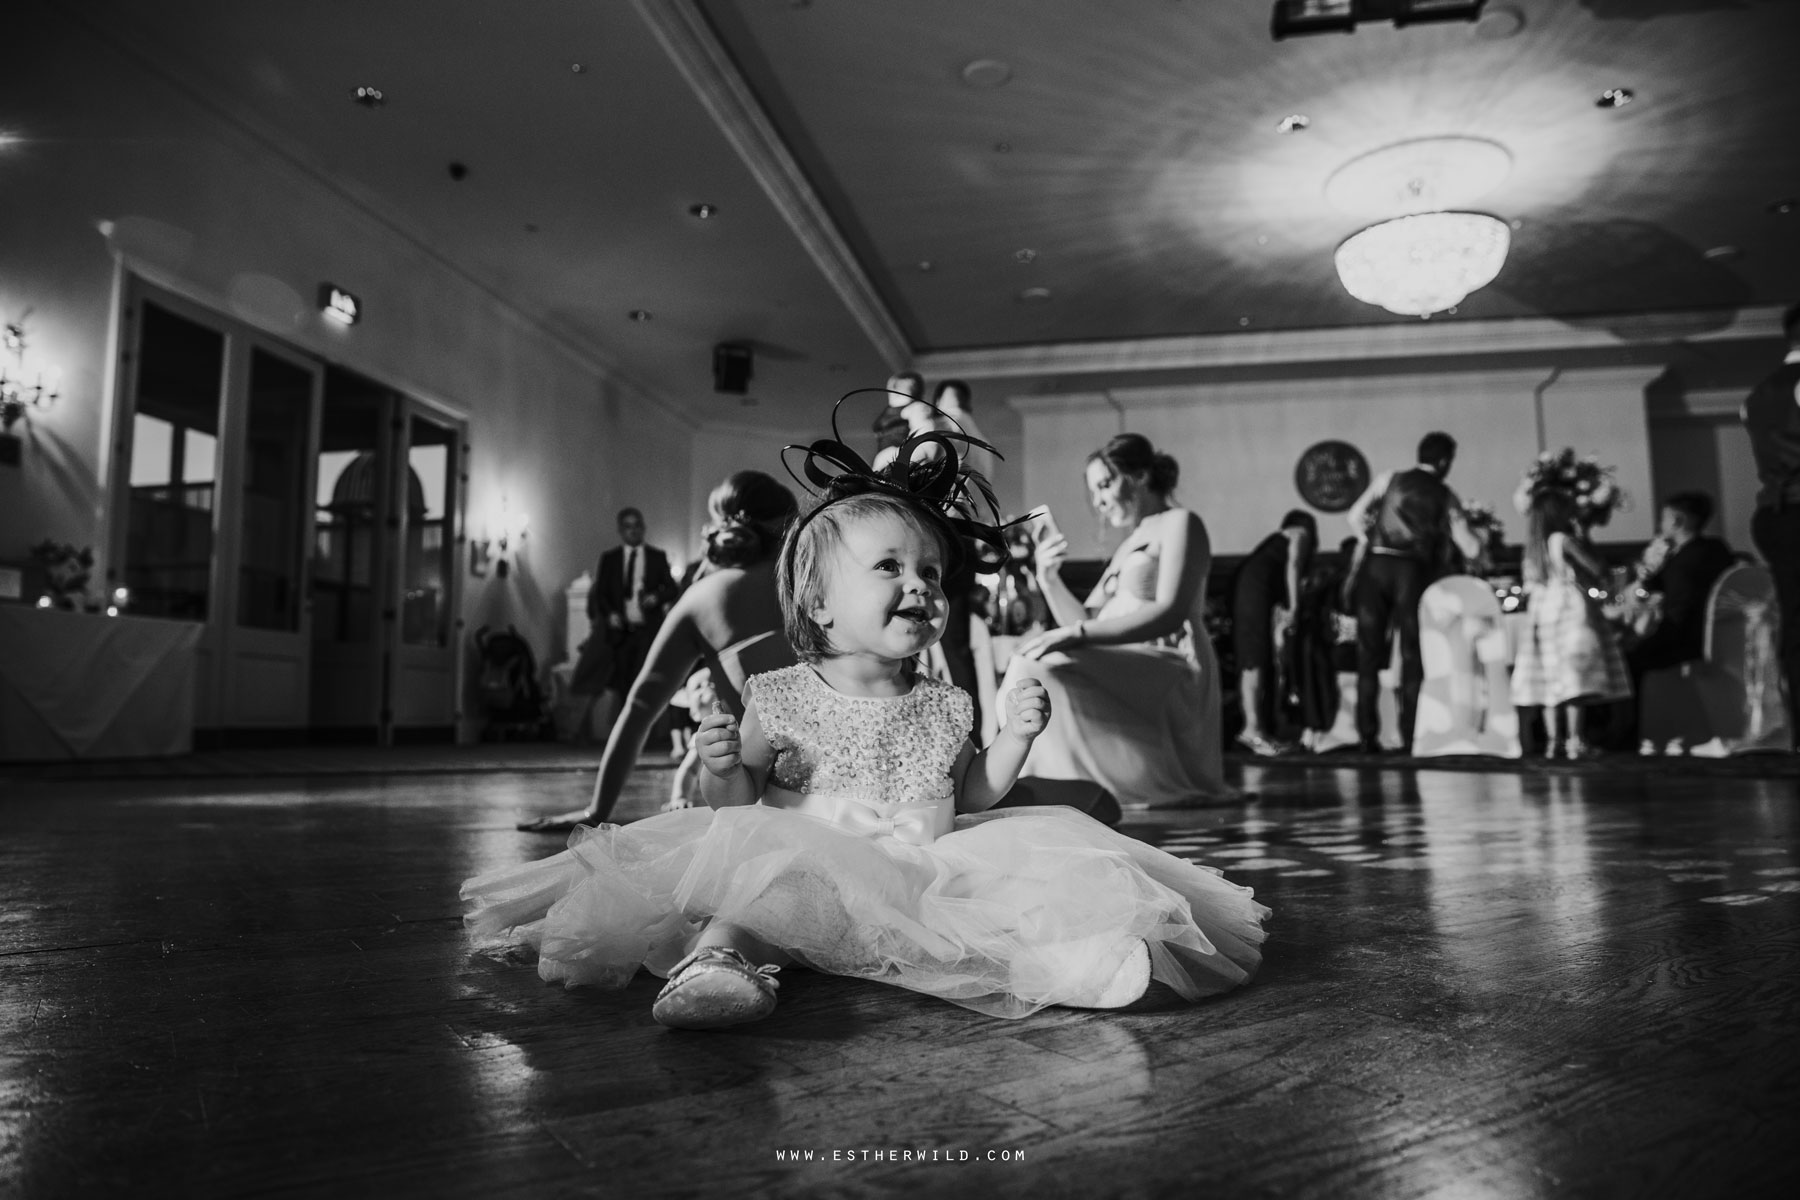 Lynford_Hall_Wedding_Thetford_Mundford_Esther_Wild_Photographer_IMG_3409-2.jpg